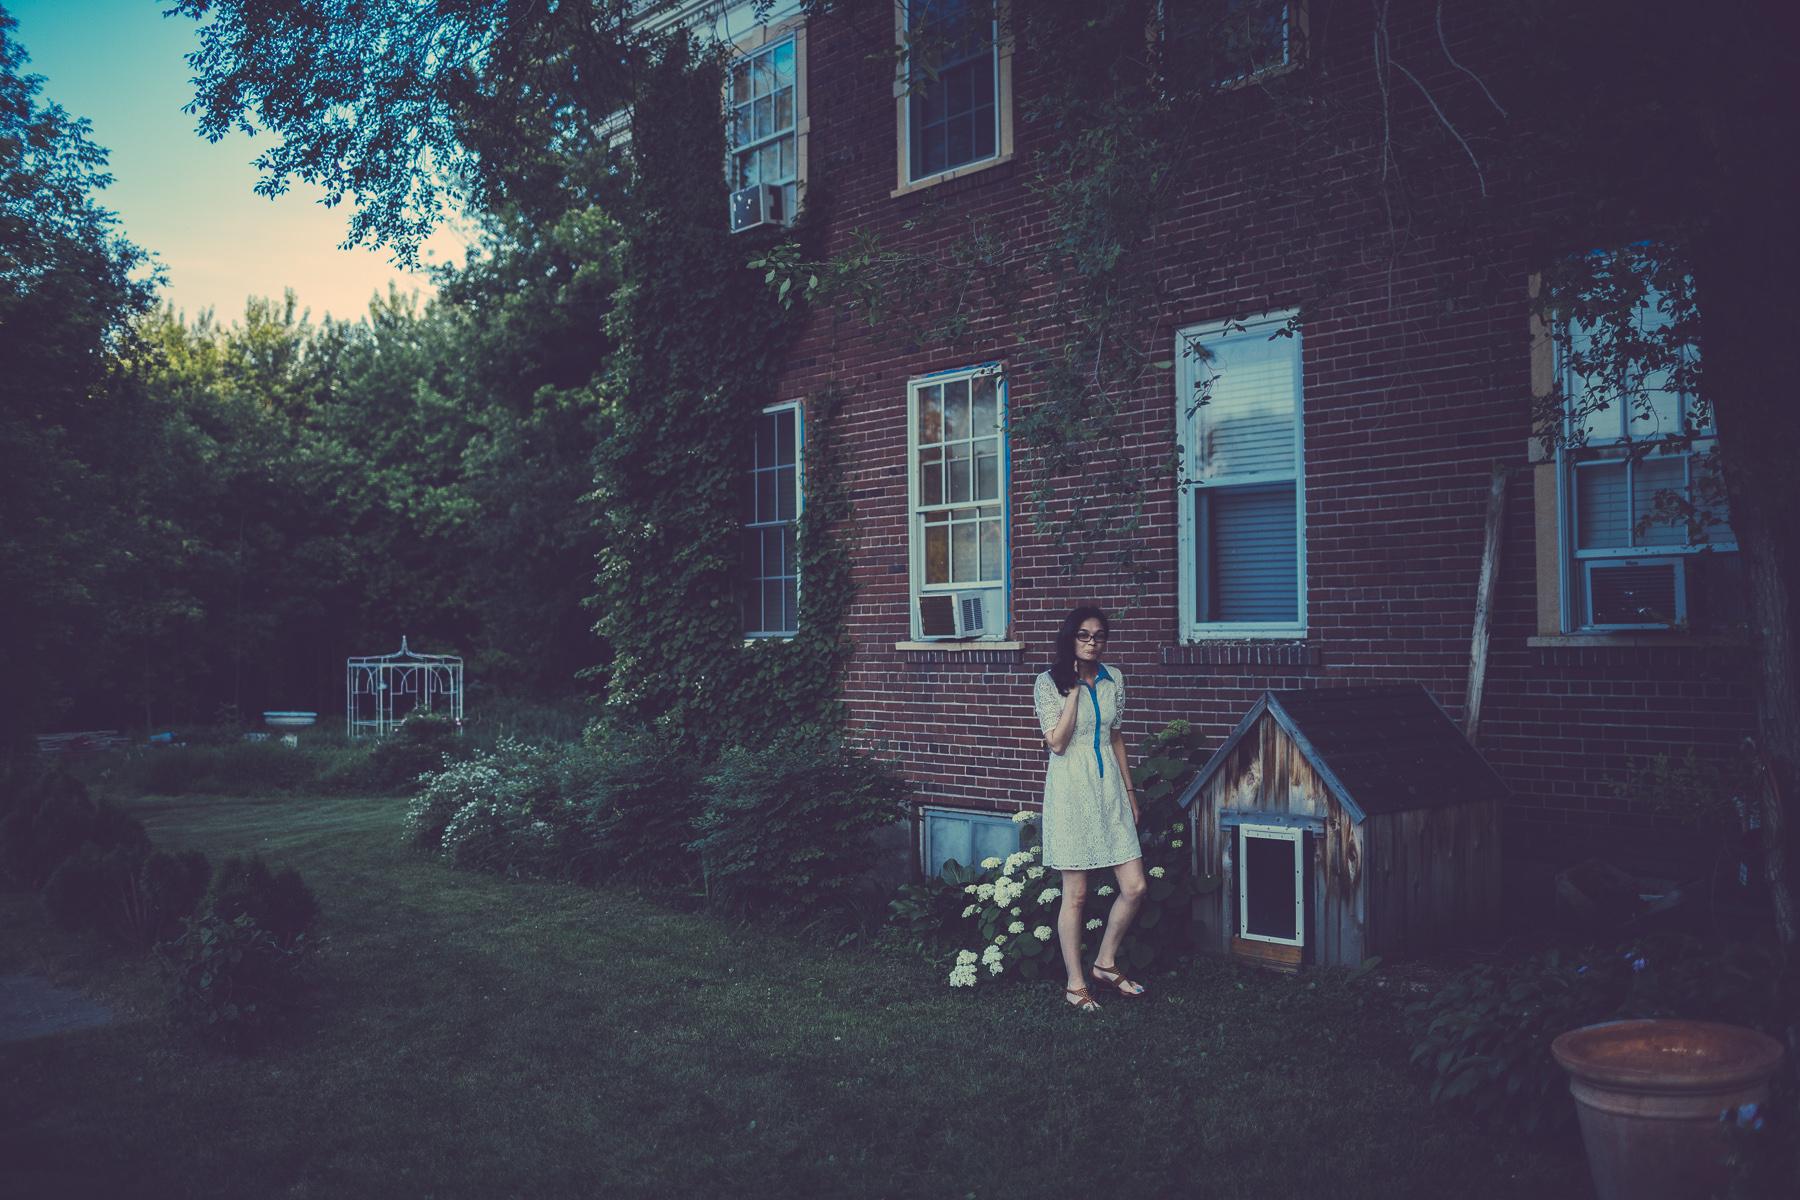 Lydia_Nihart_At_The_Outing_Lodge_Stillwater_Minnesota_By_Photographer_Joe_Lemke_033.JPG